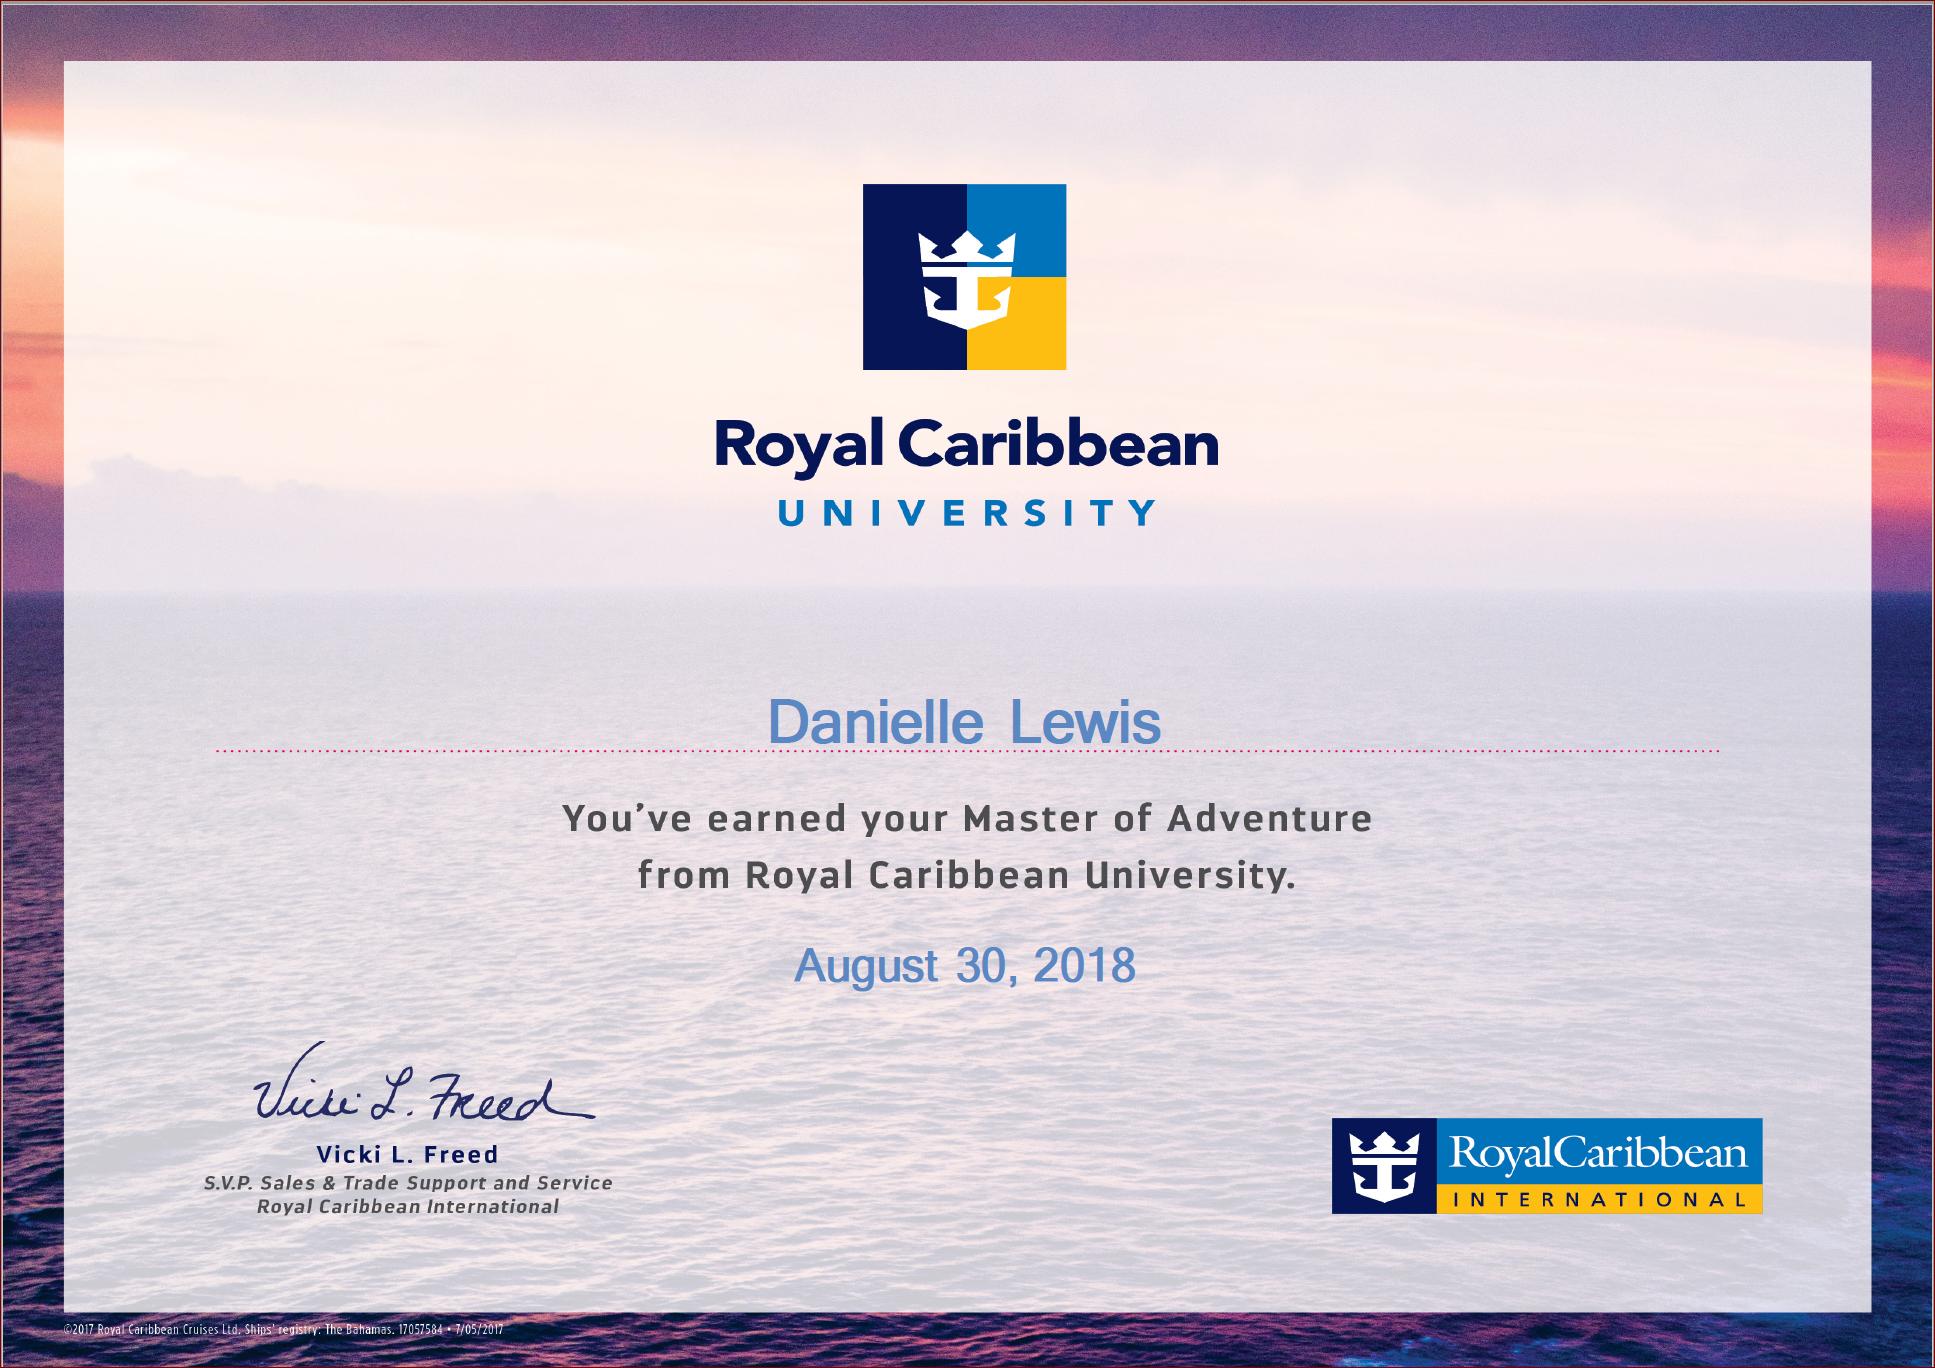 SelfishMe Travel - Royal Caribbean Cruise Line University Master of Adventure